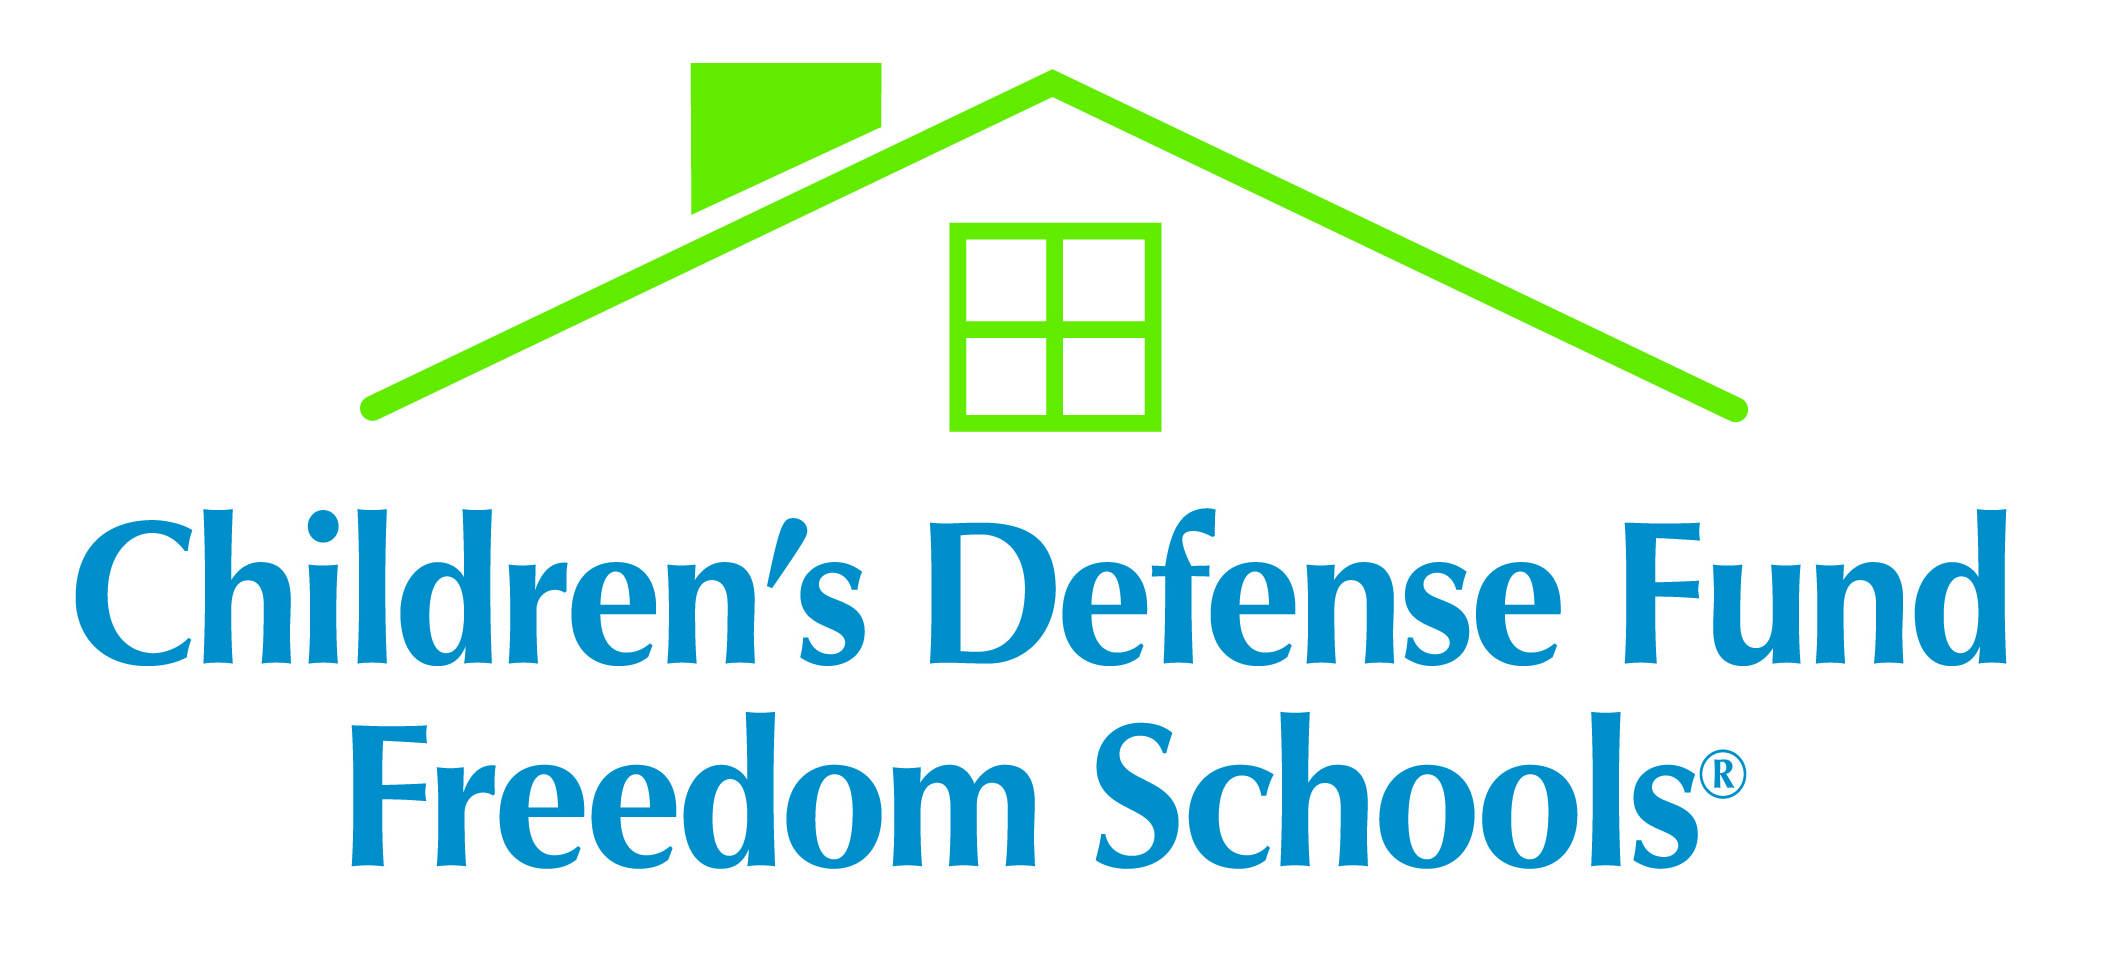 freedom-schools.jpg